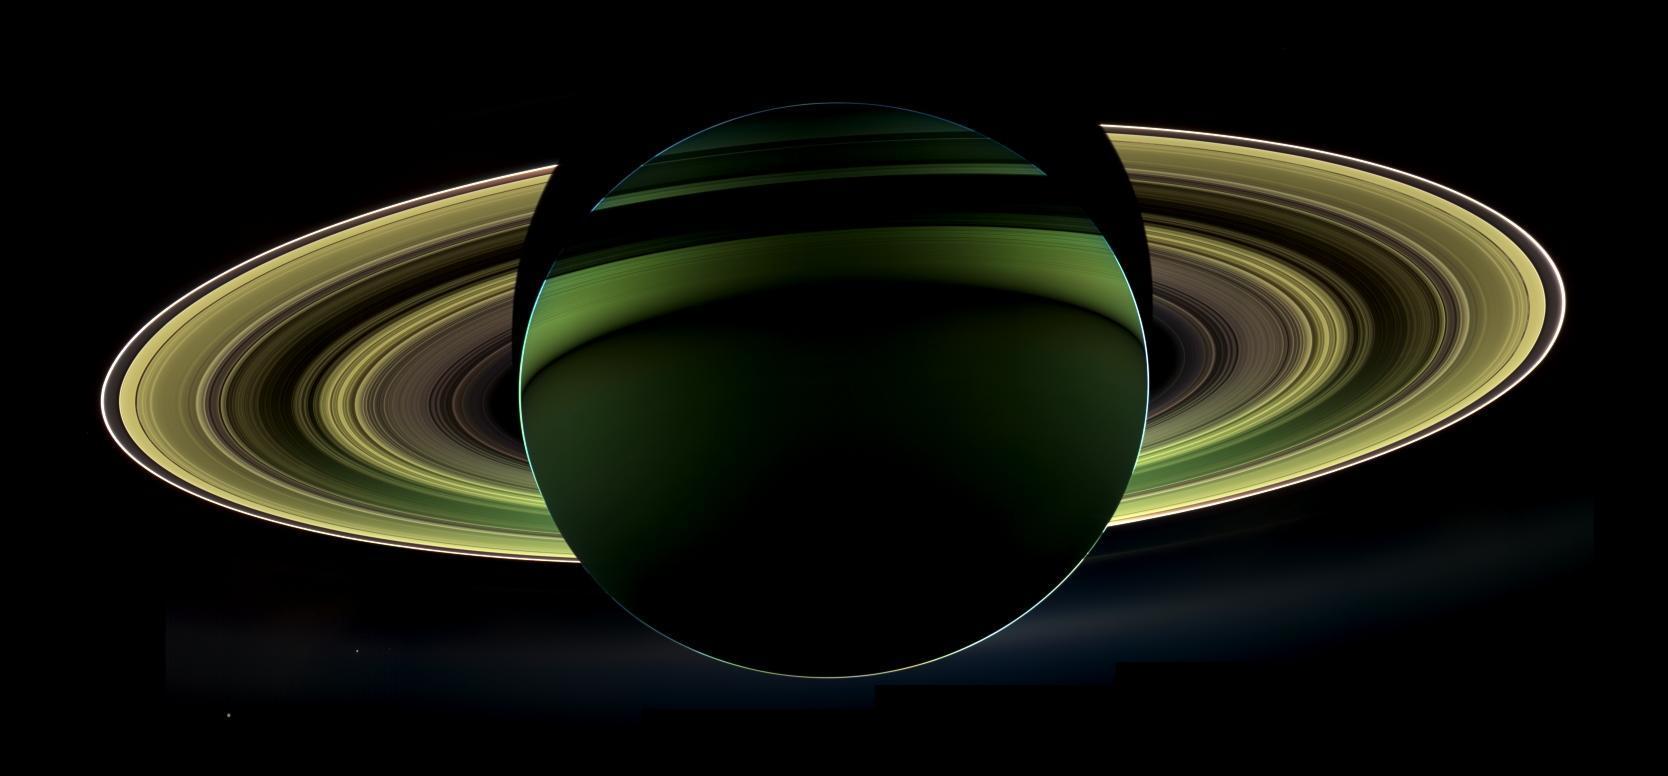 NASA's Cassini Found 'Kittens' in Saturn's F Ring | Inverse